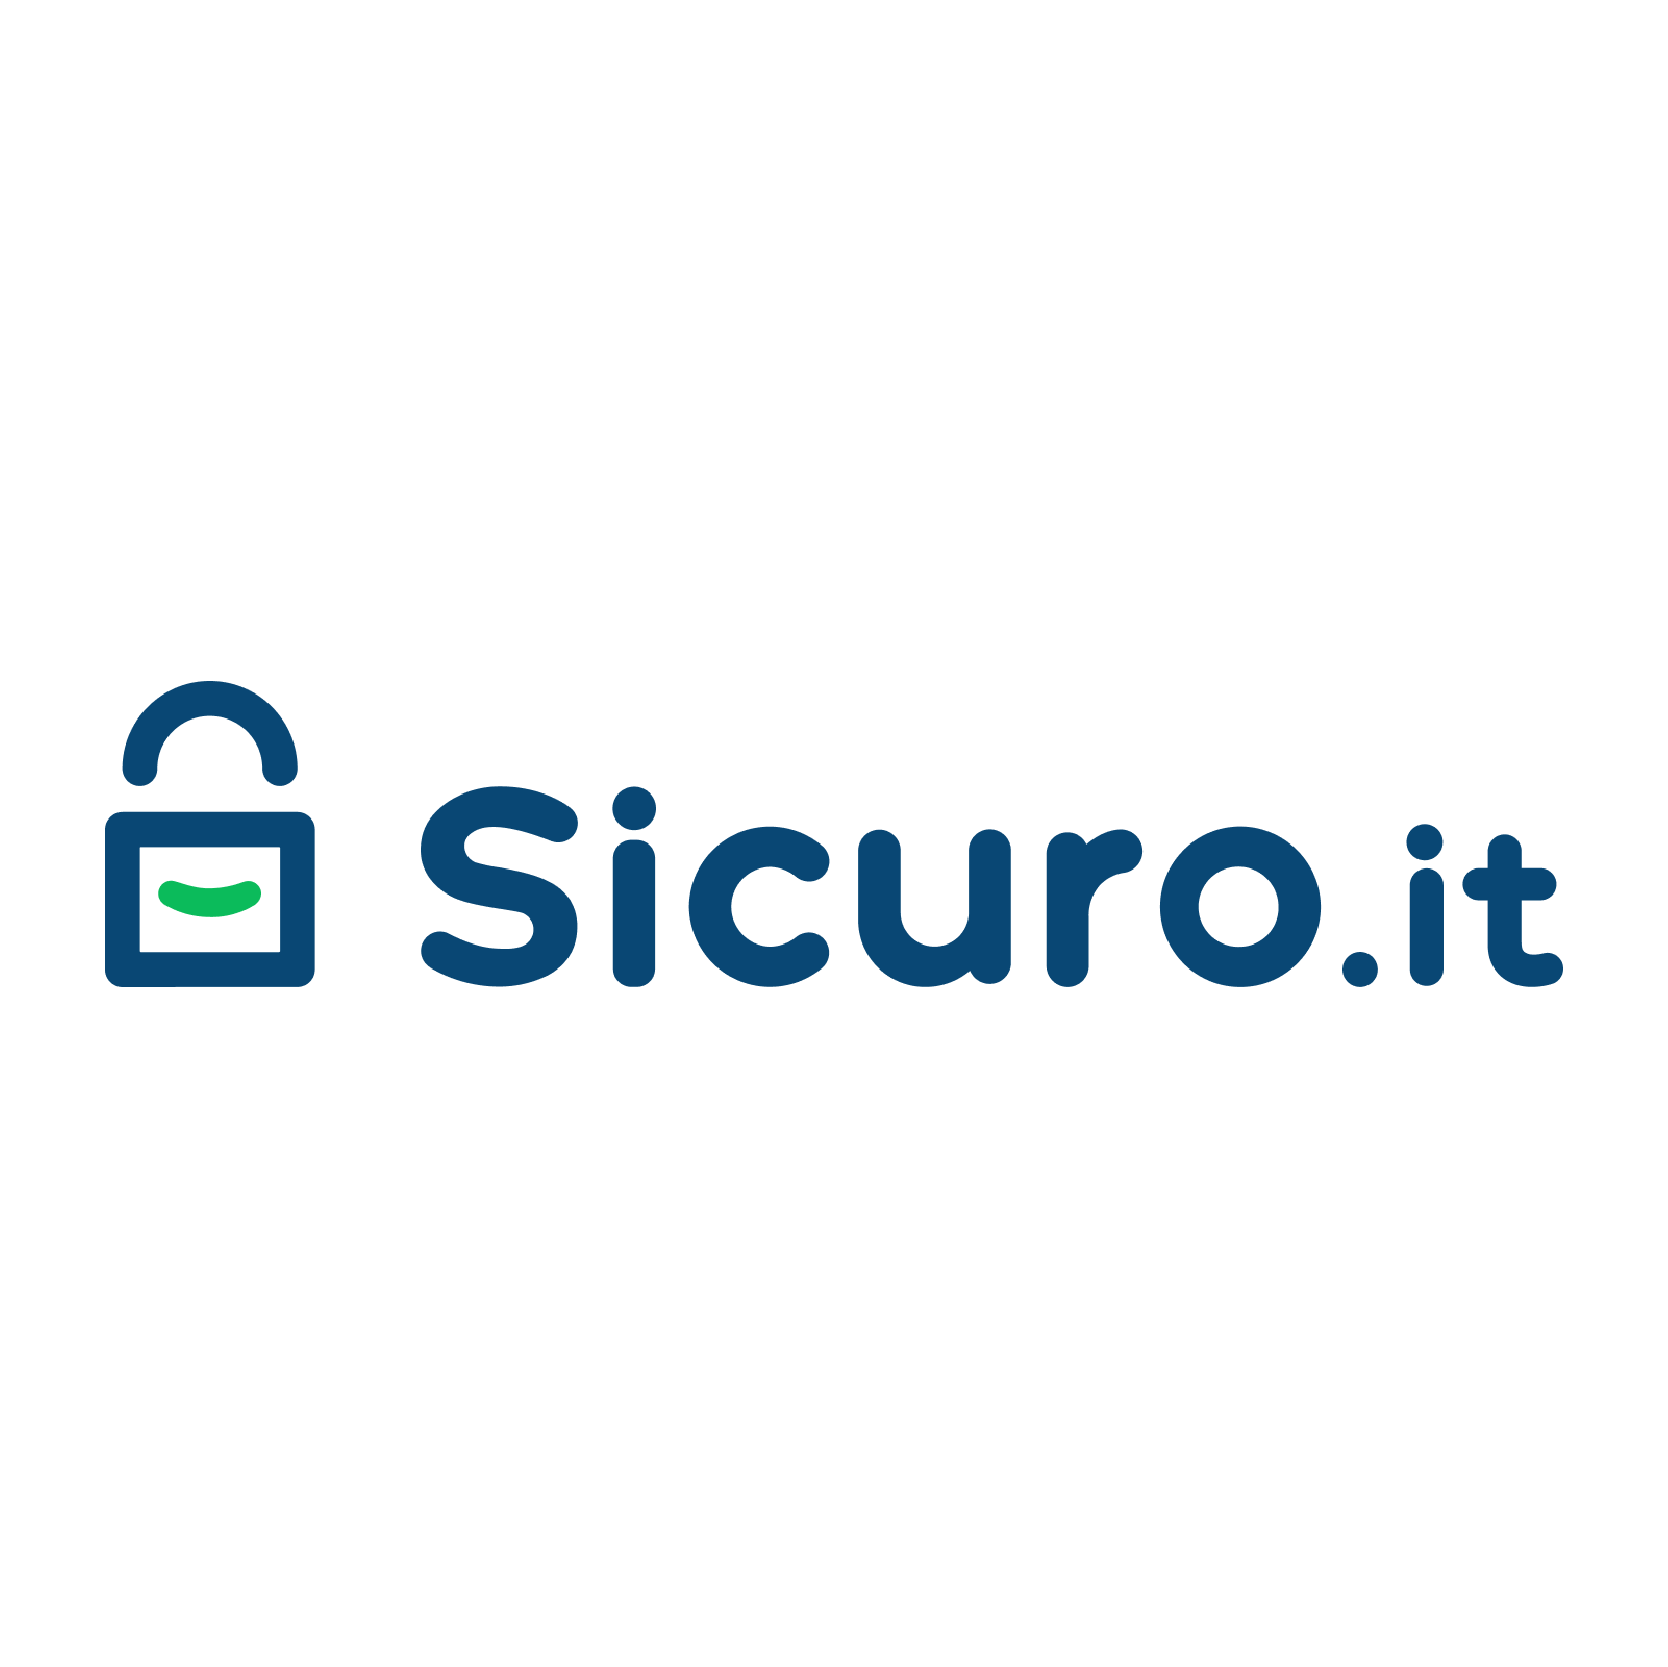 Gruppo Sicuro.it srl